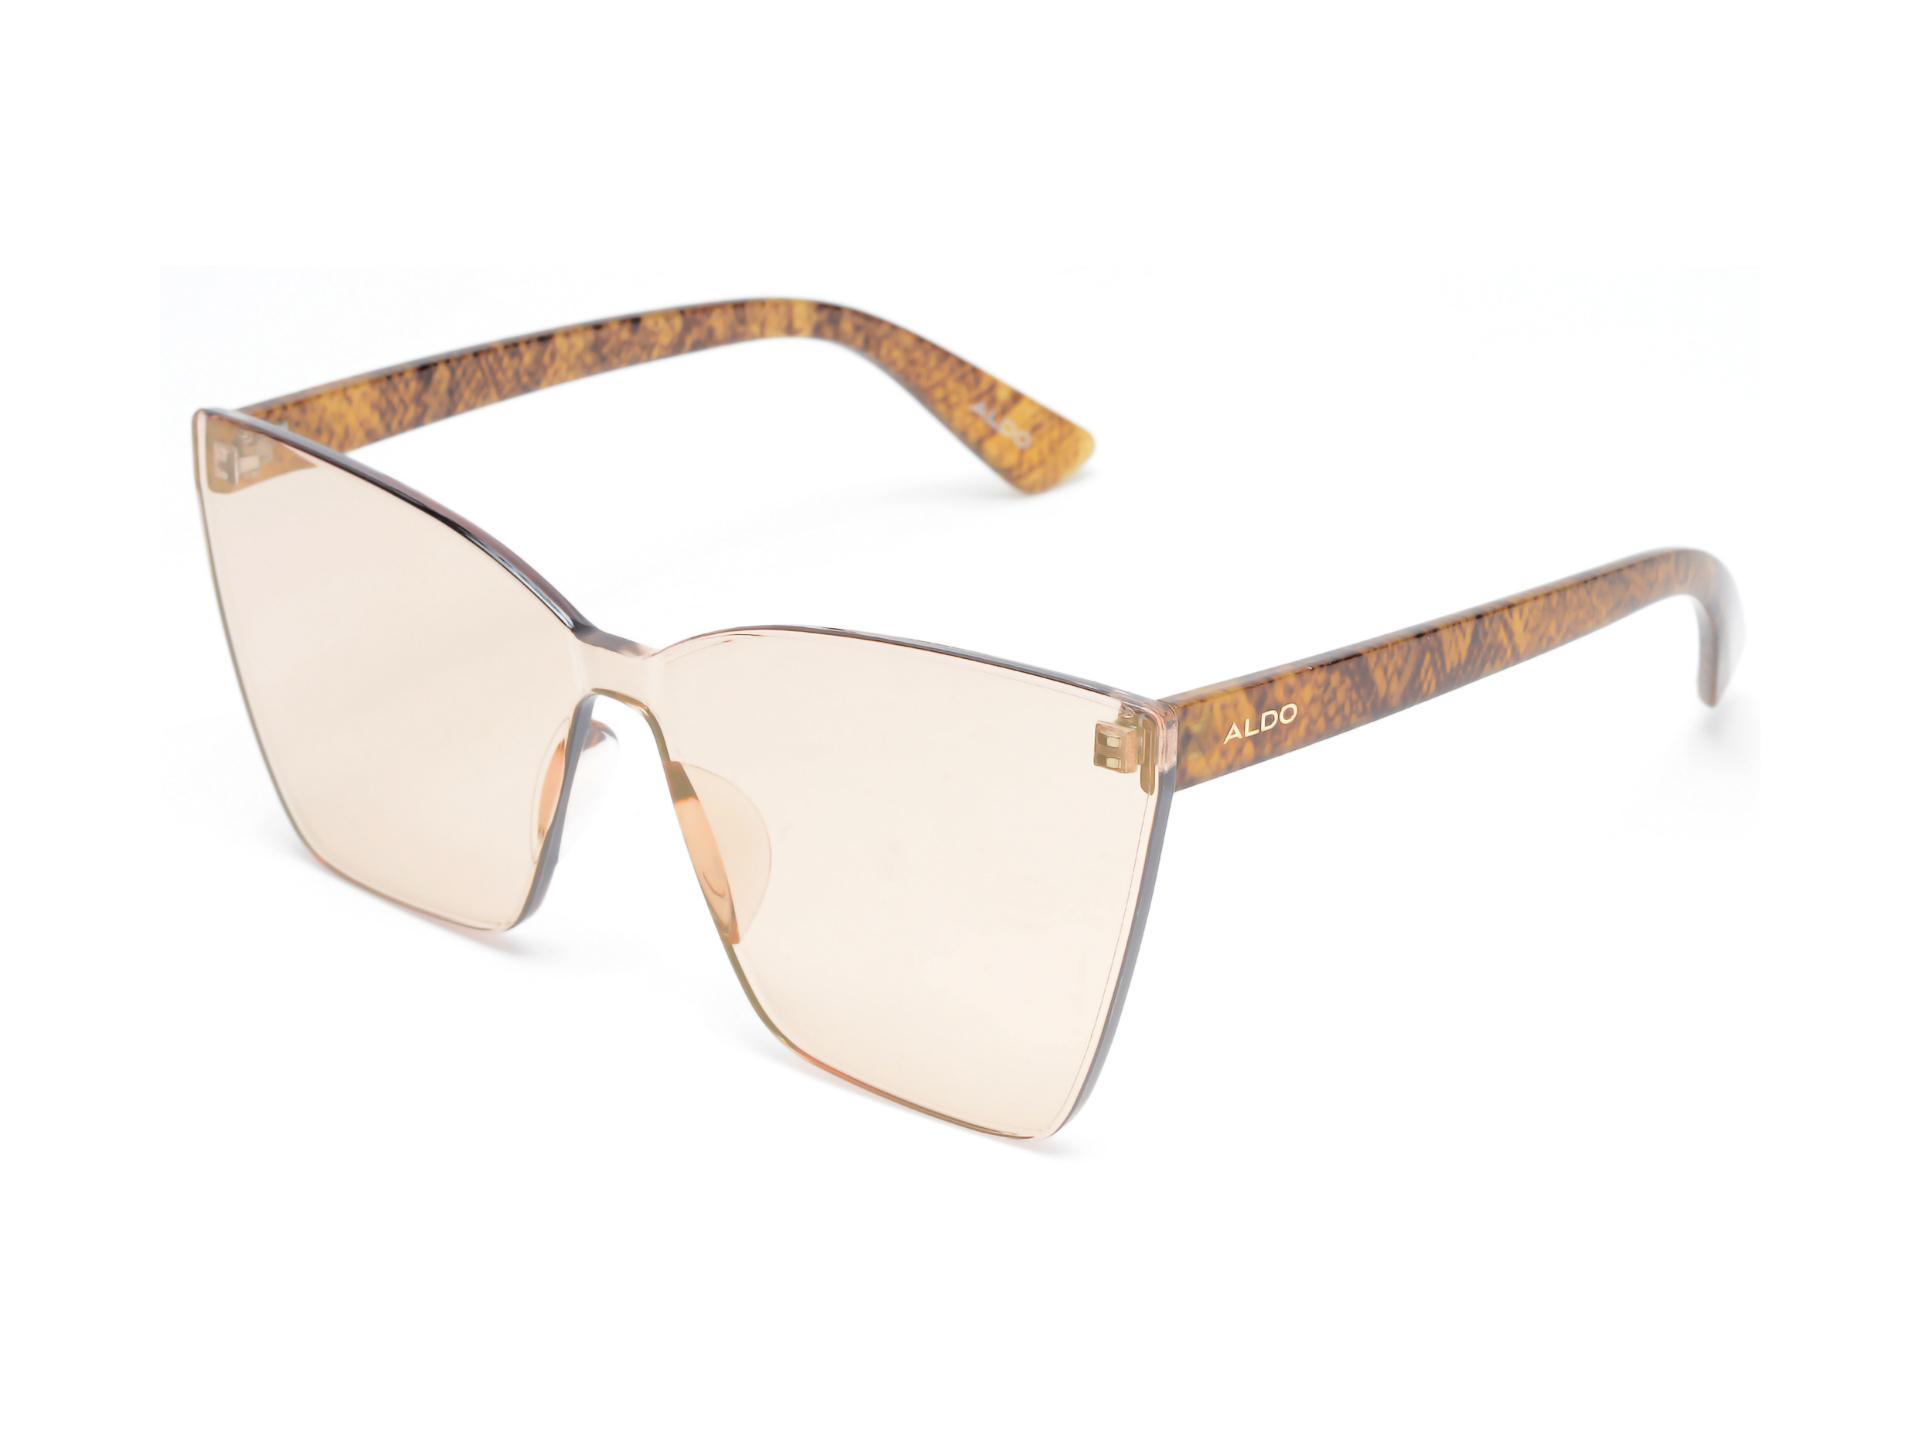 Ochelari de soare ALDO maro, Batti200, din plastic imagine